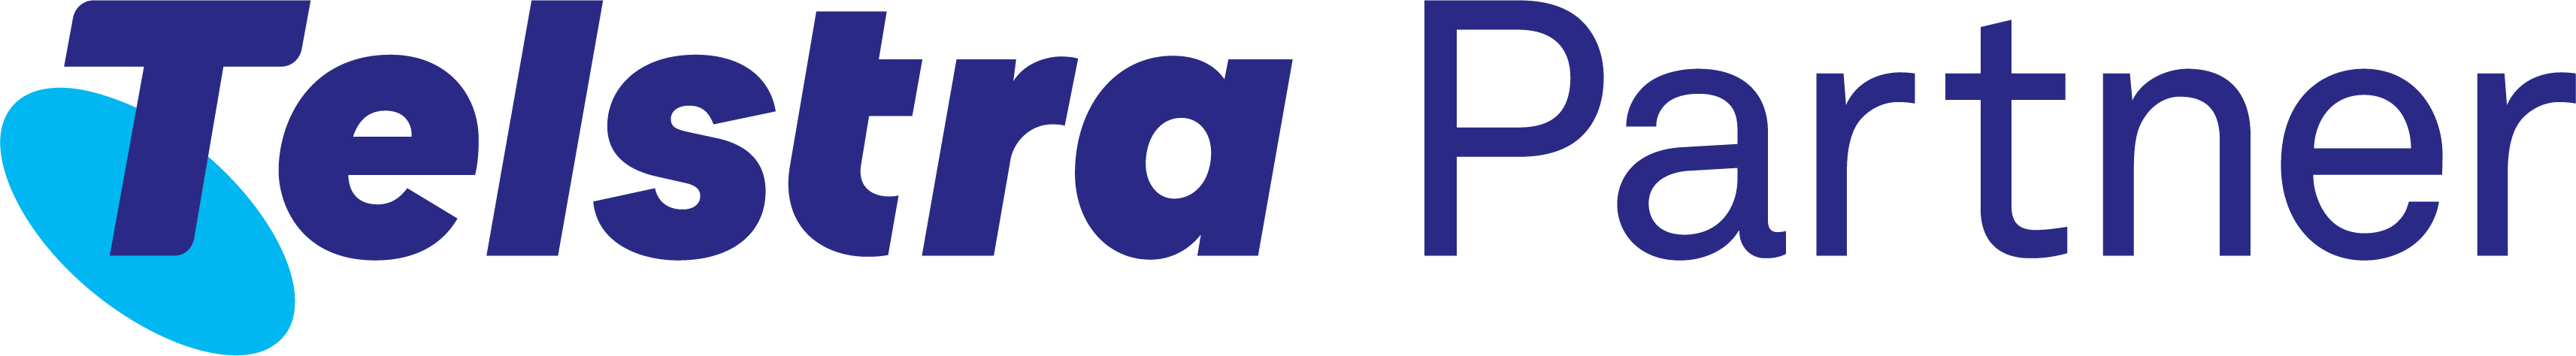 Telstra-Partner-International-Blue-Primary-CMYK-20